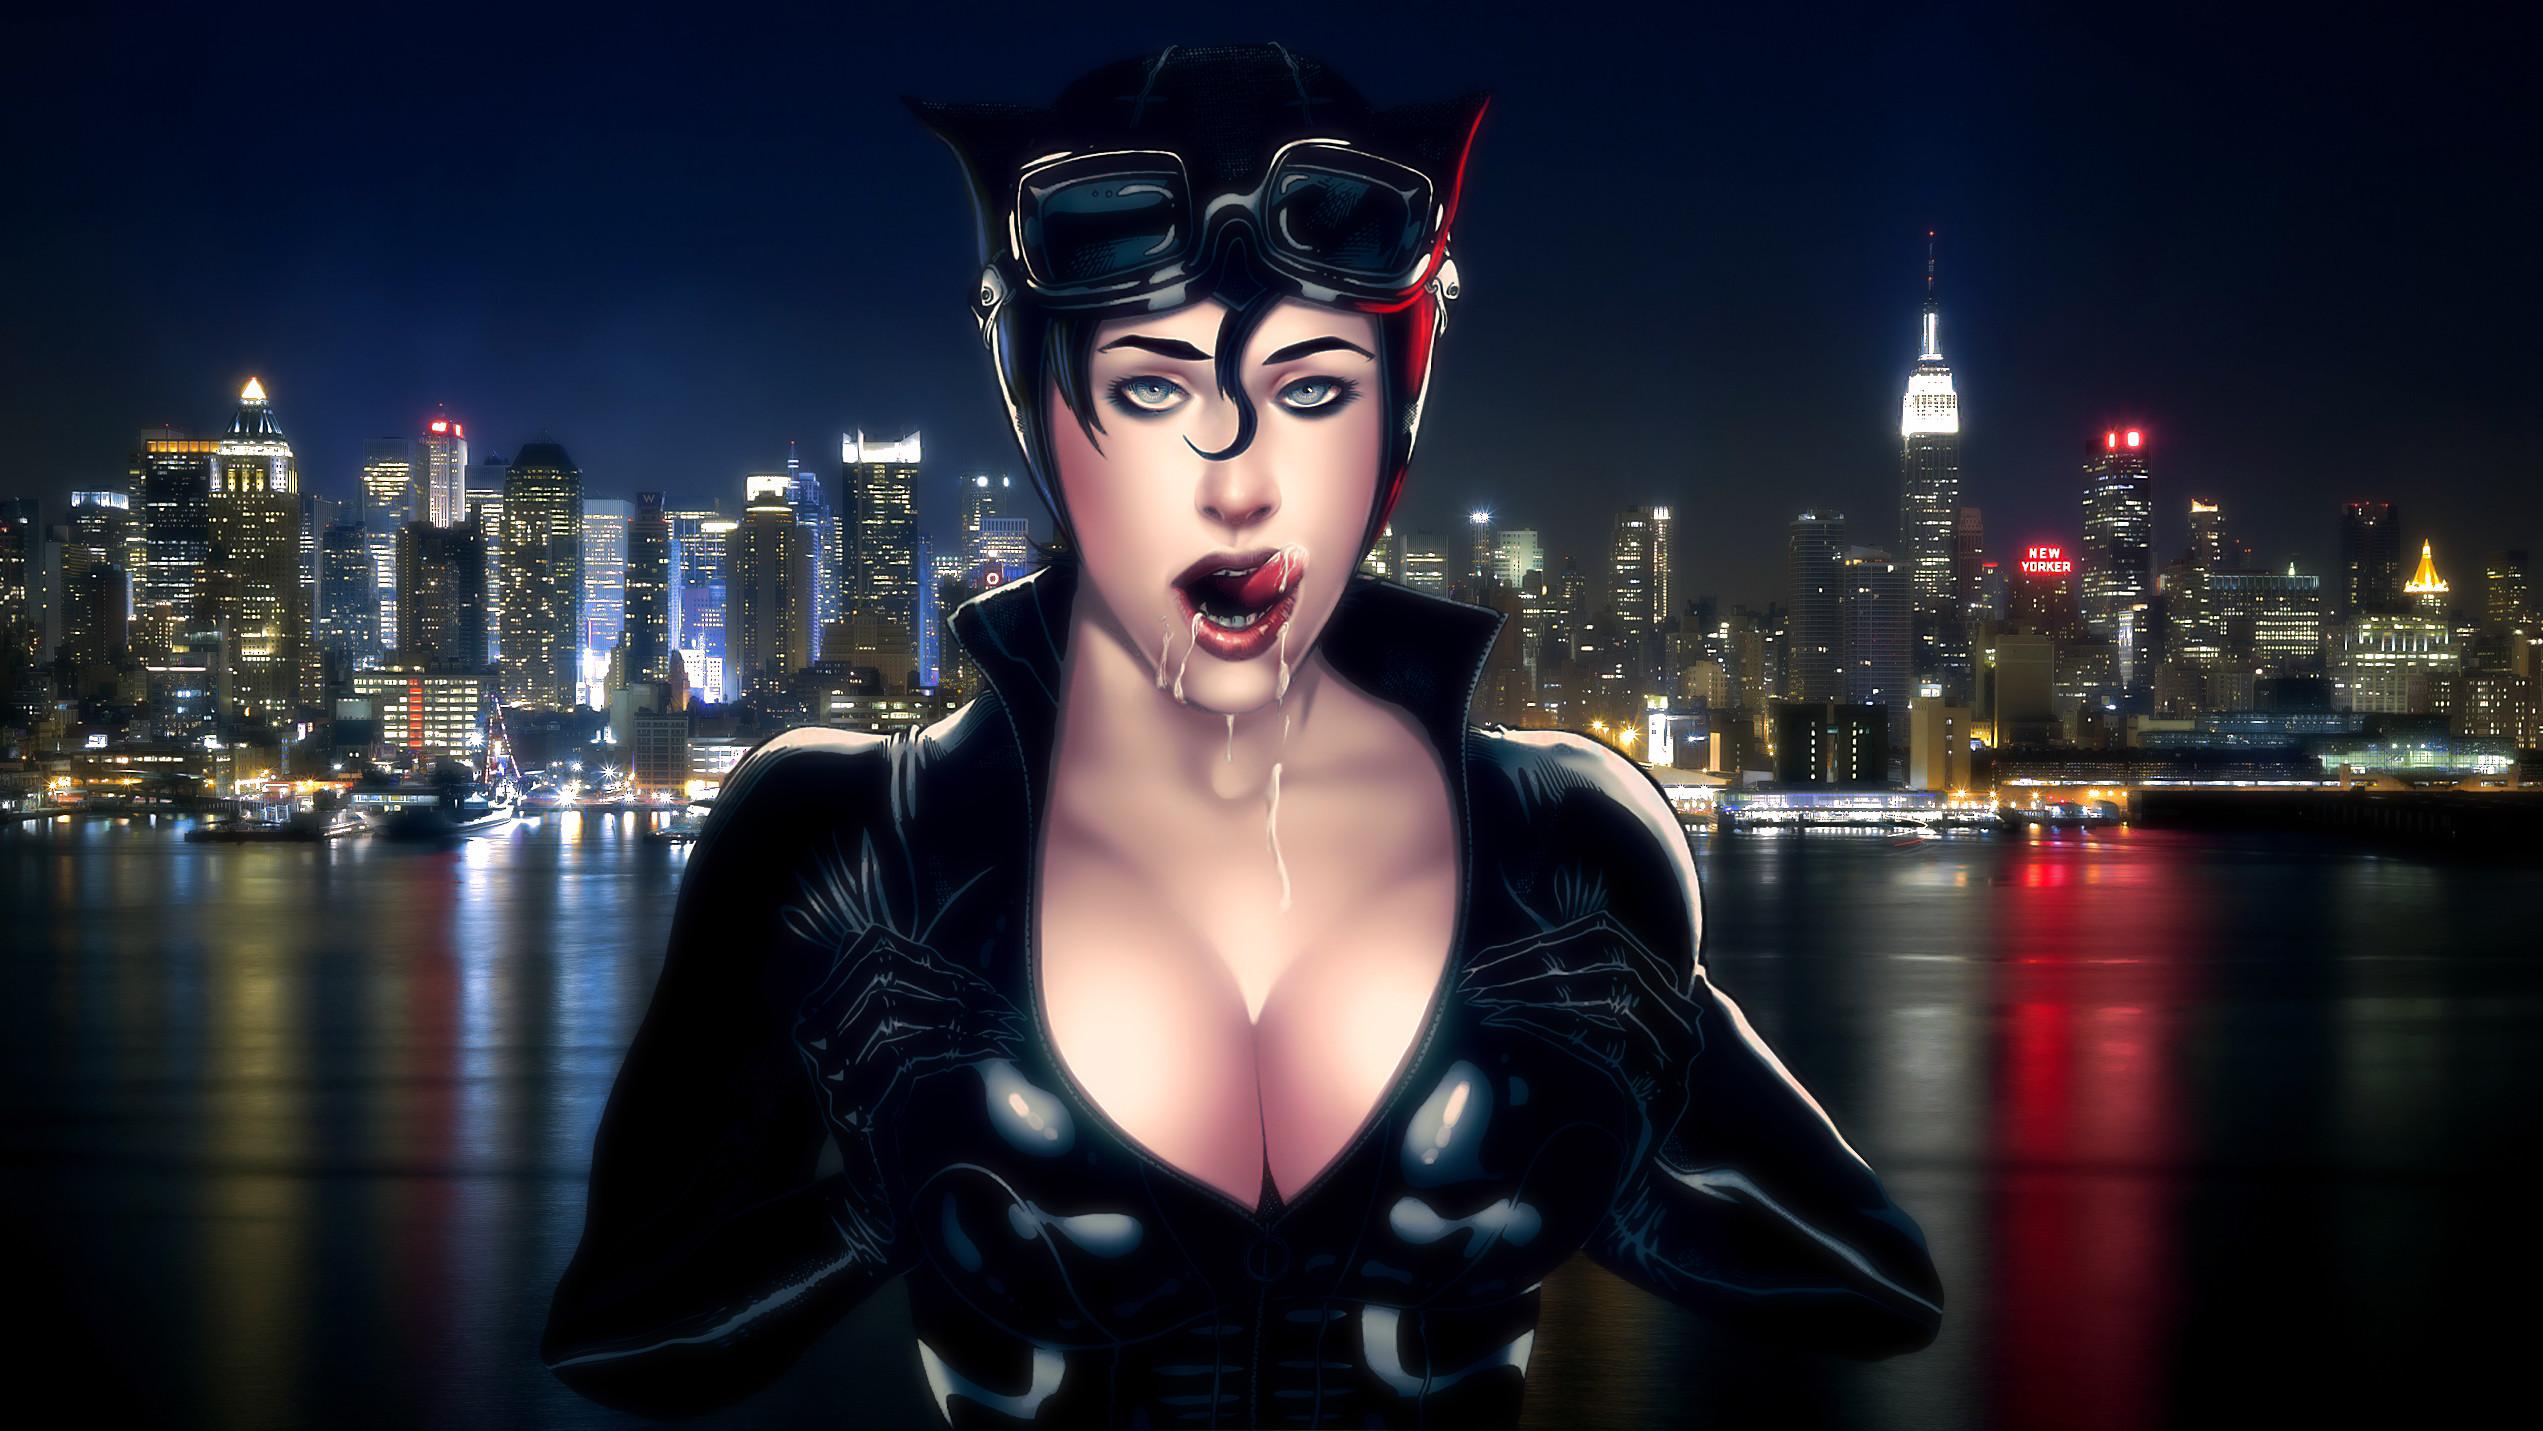 Catwoman Hot | Catwoman HD wallpaper by Phantom3013